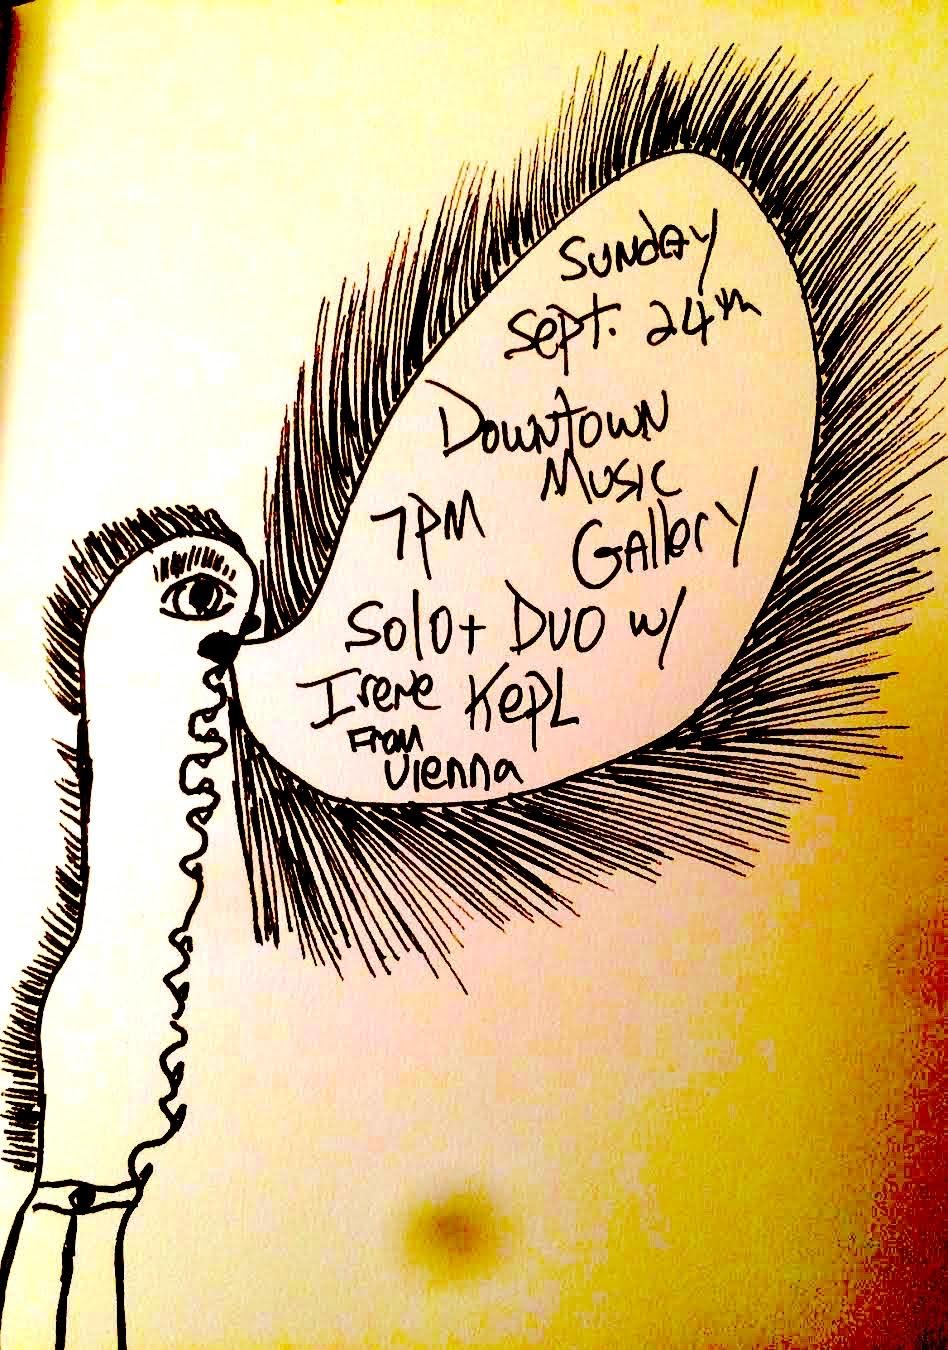 Sunday Downtown Music Gallery N - davidgrollman | ello